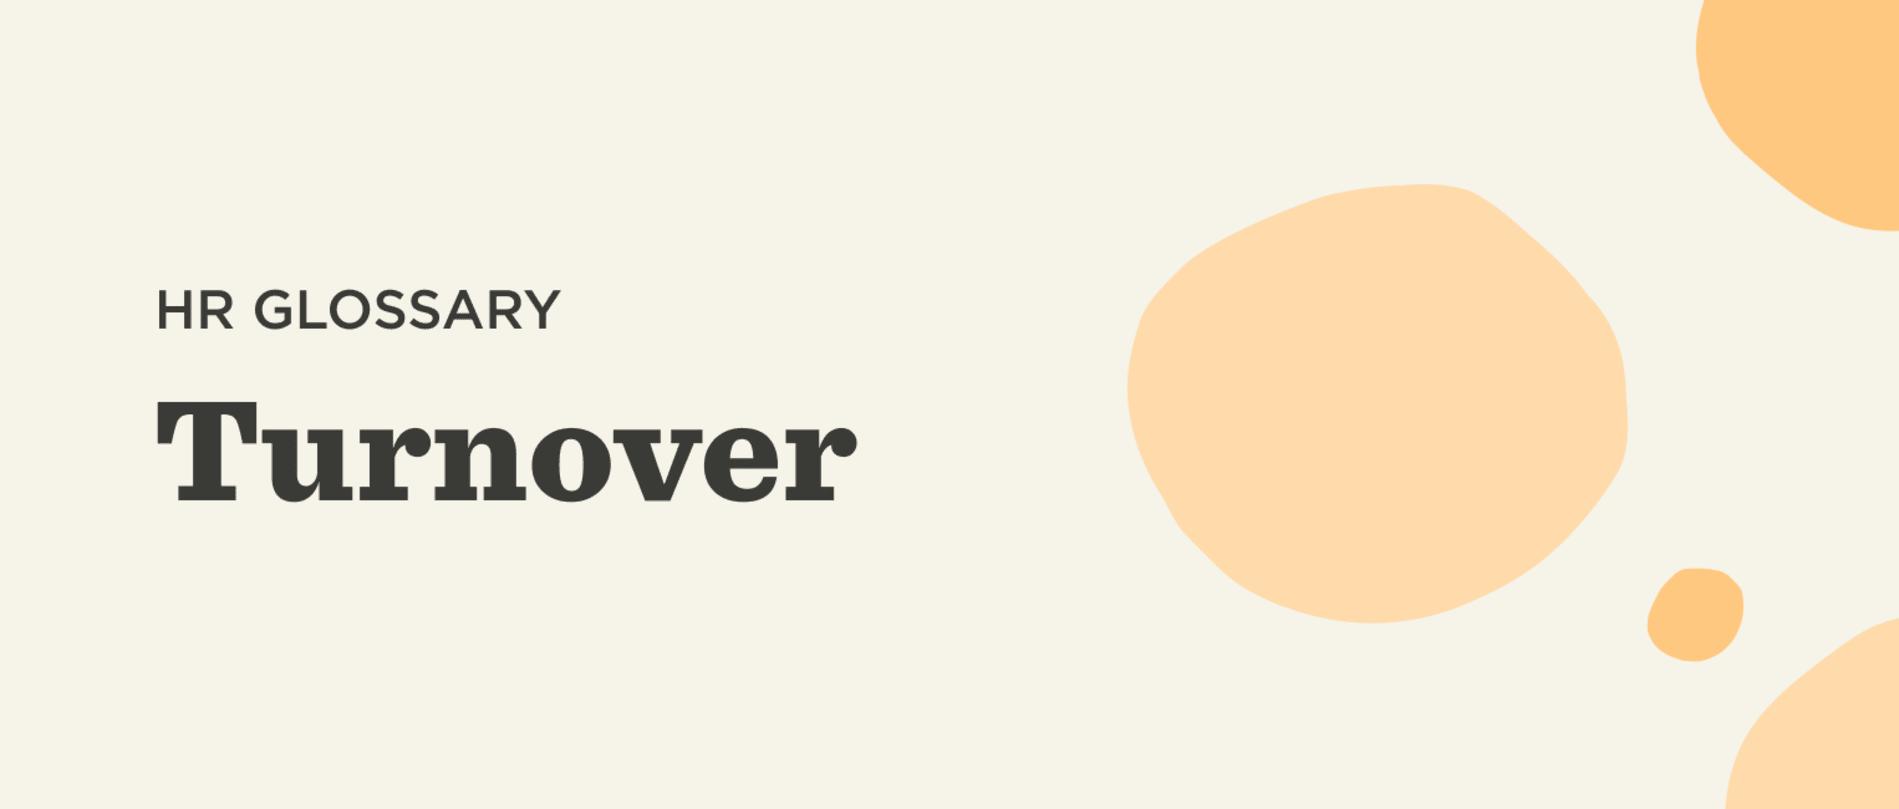 Turnover-Glossary-banner